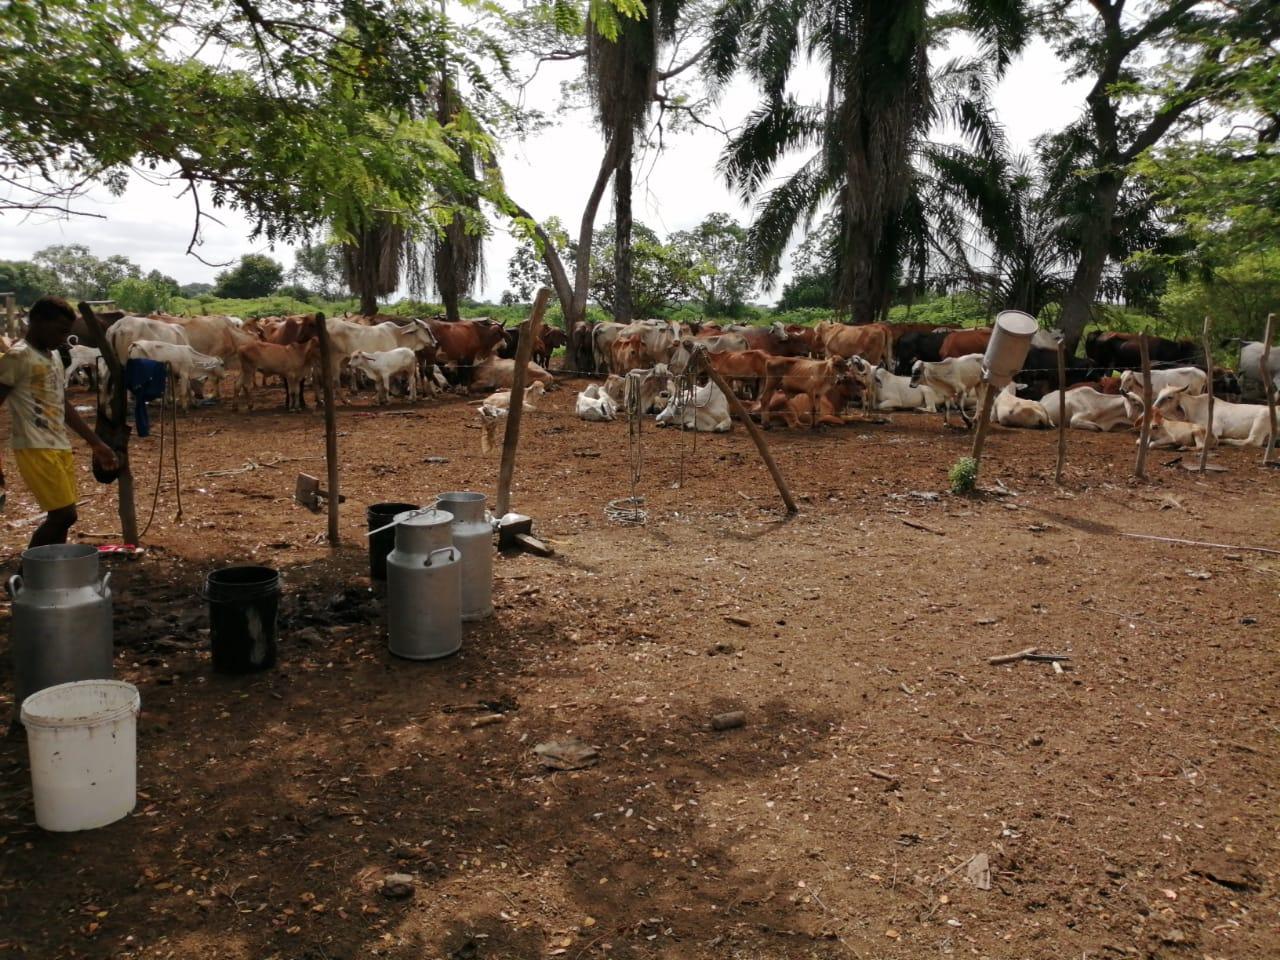 Actividades de ganadería en Rincón Guapo Loveran.